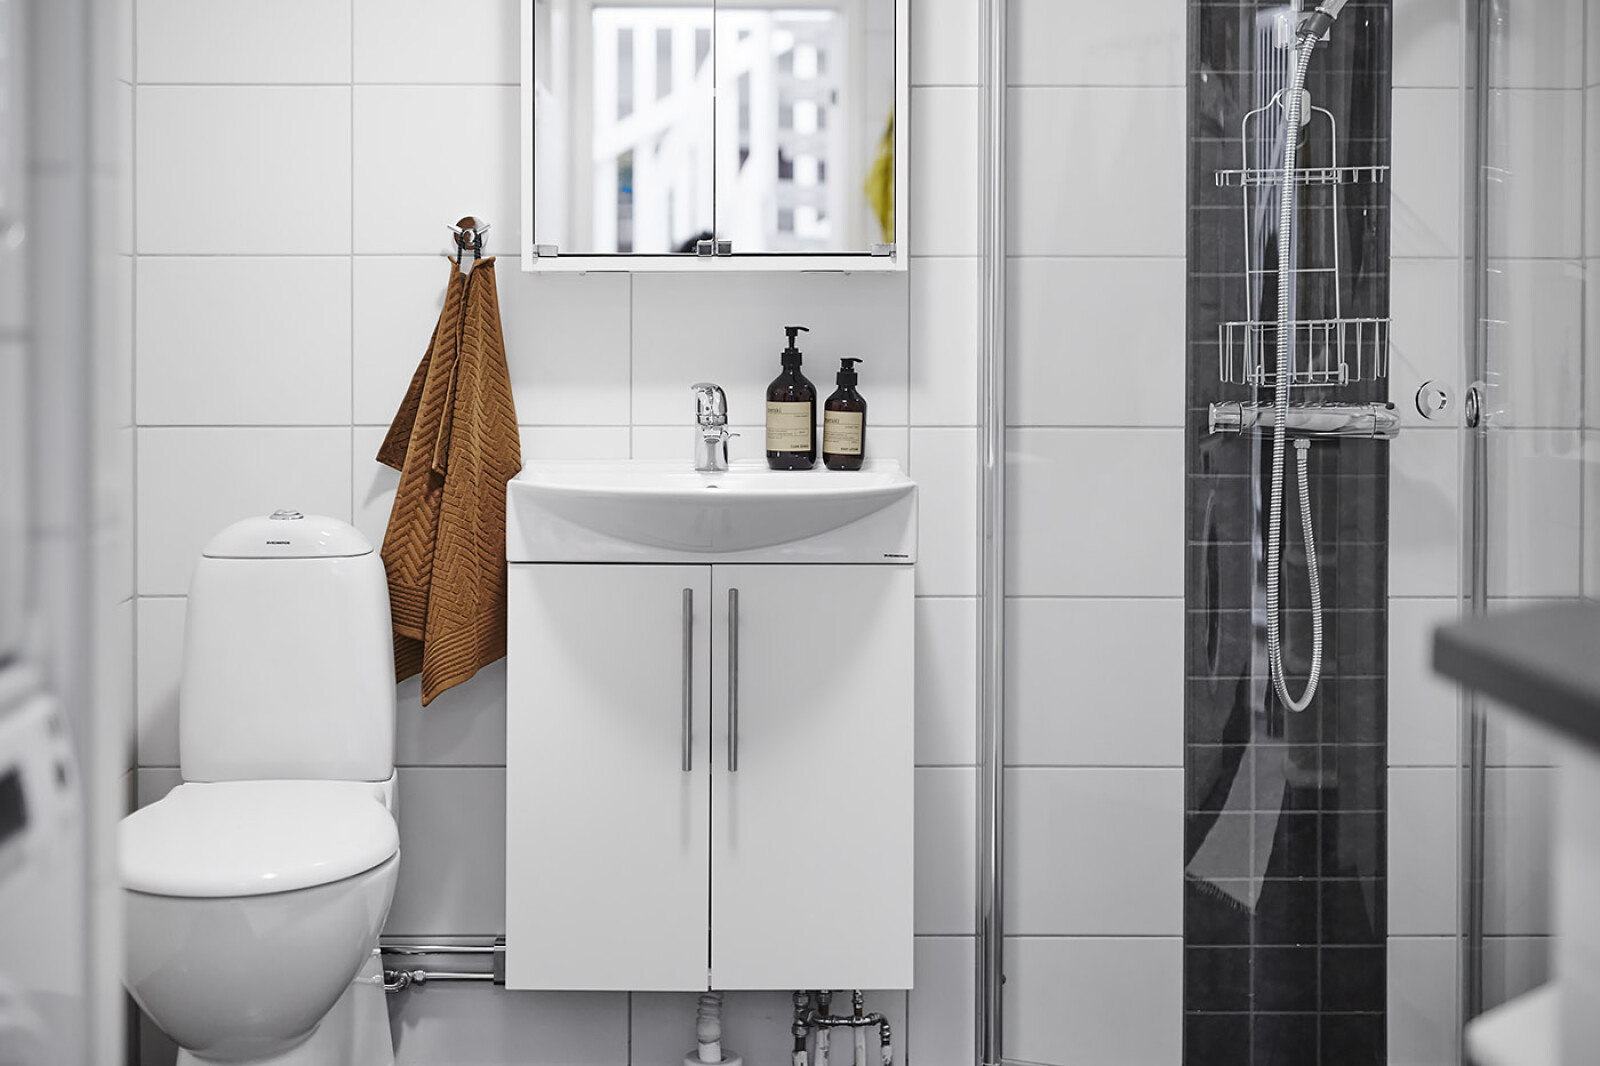 Badrum - Tvätt..